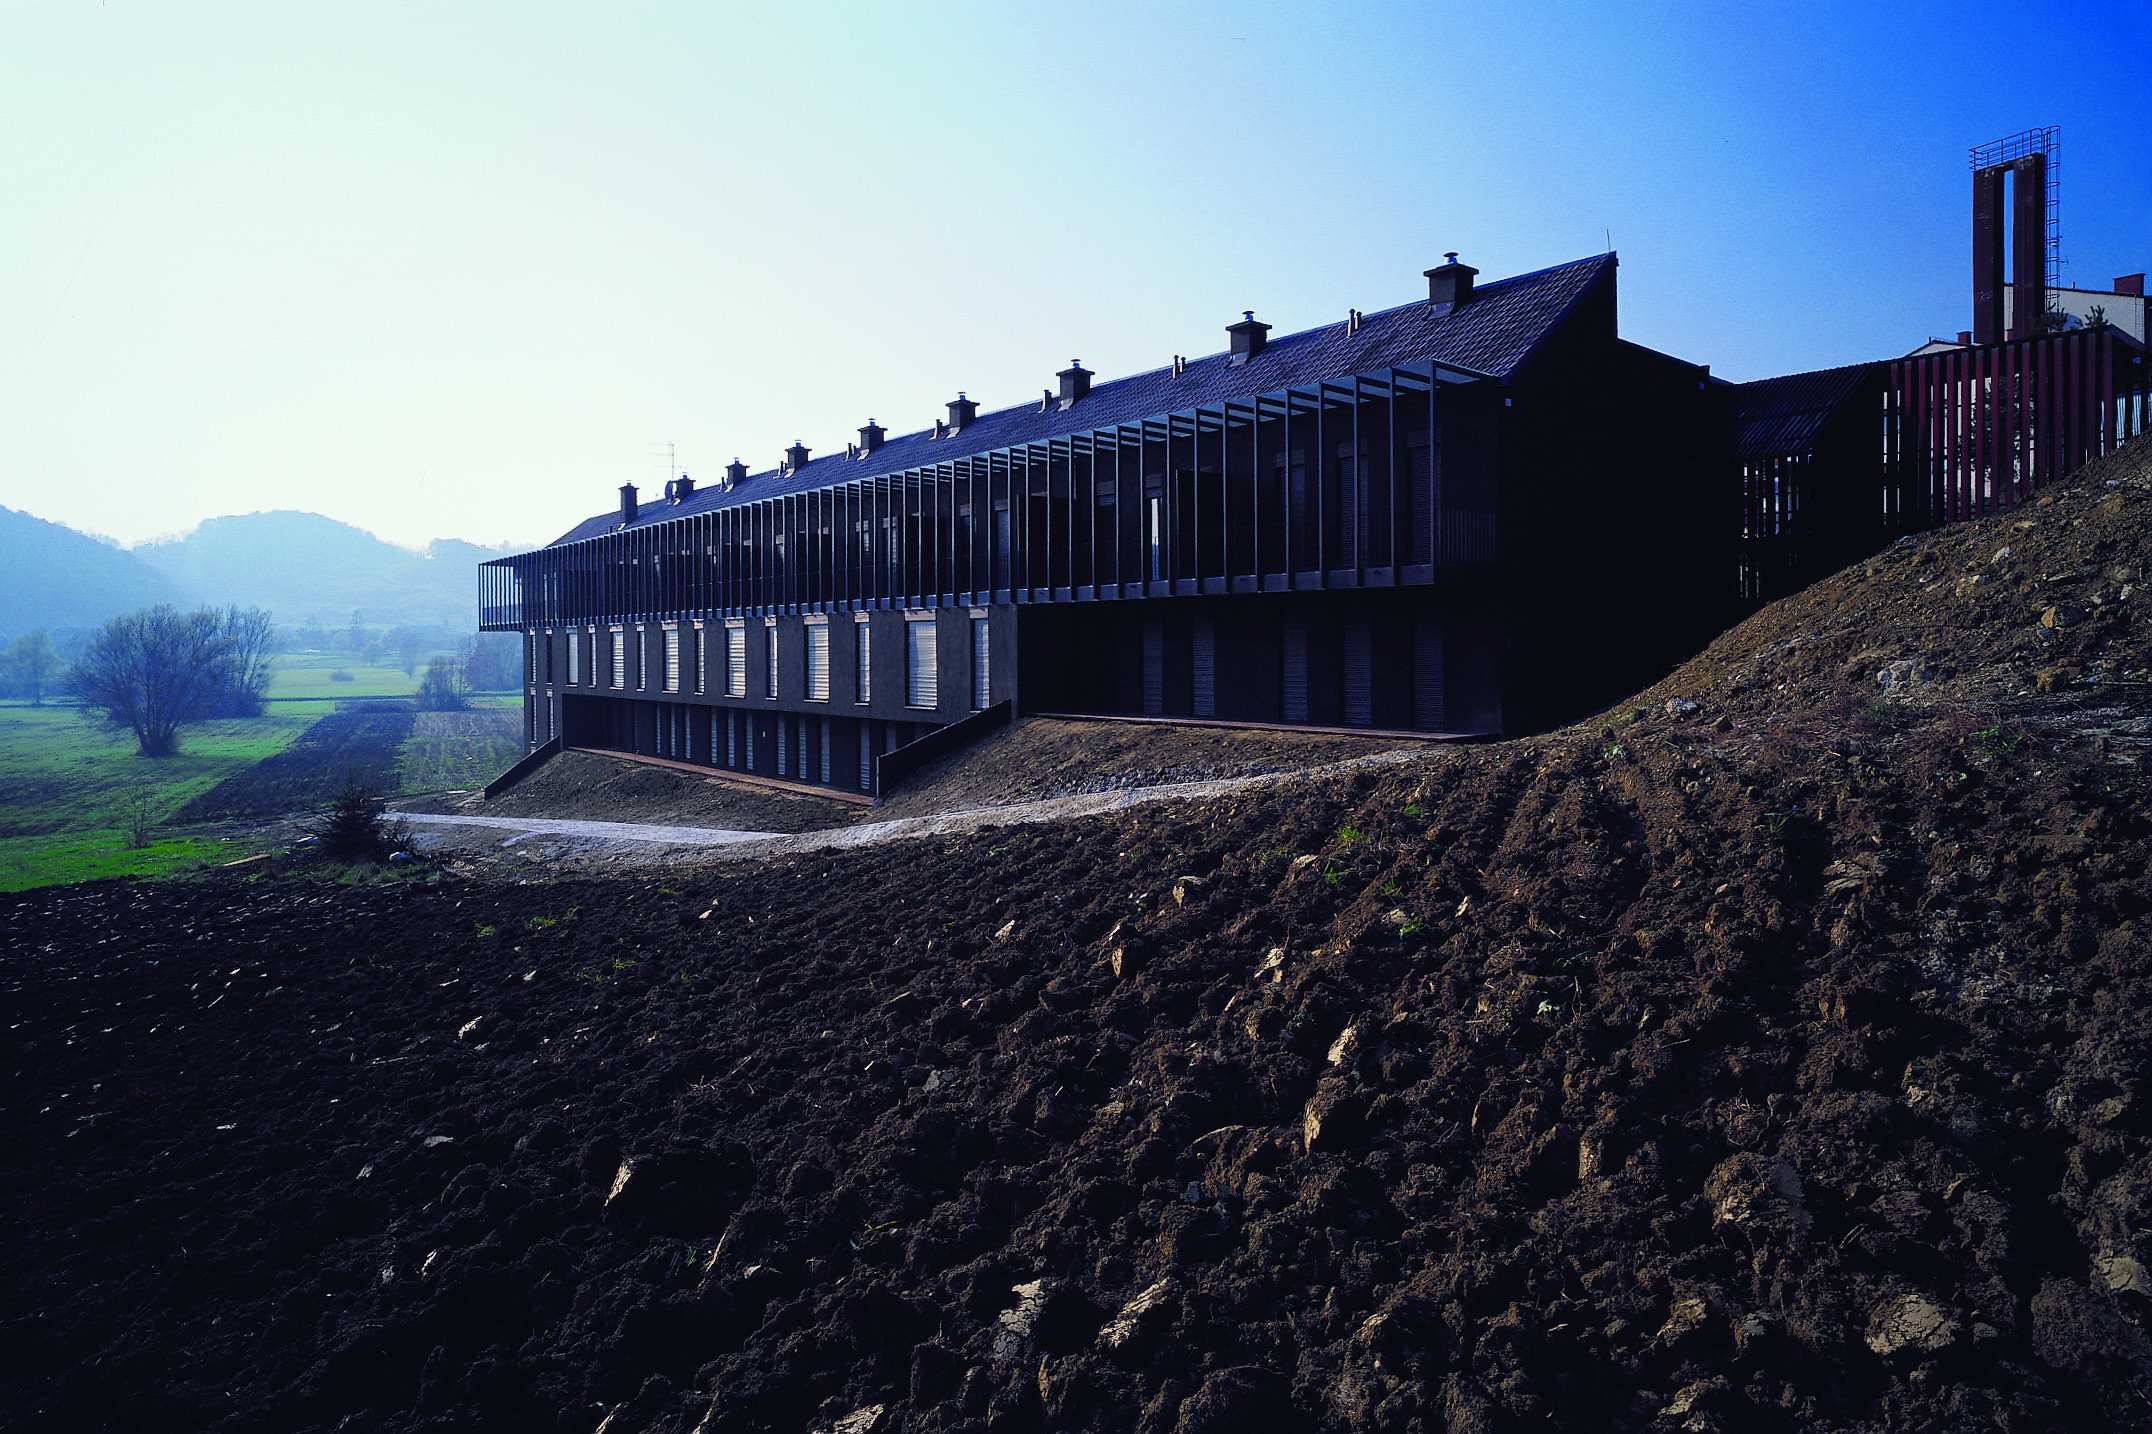 Before construction. Photo: Damir Fabijanić